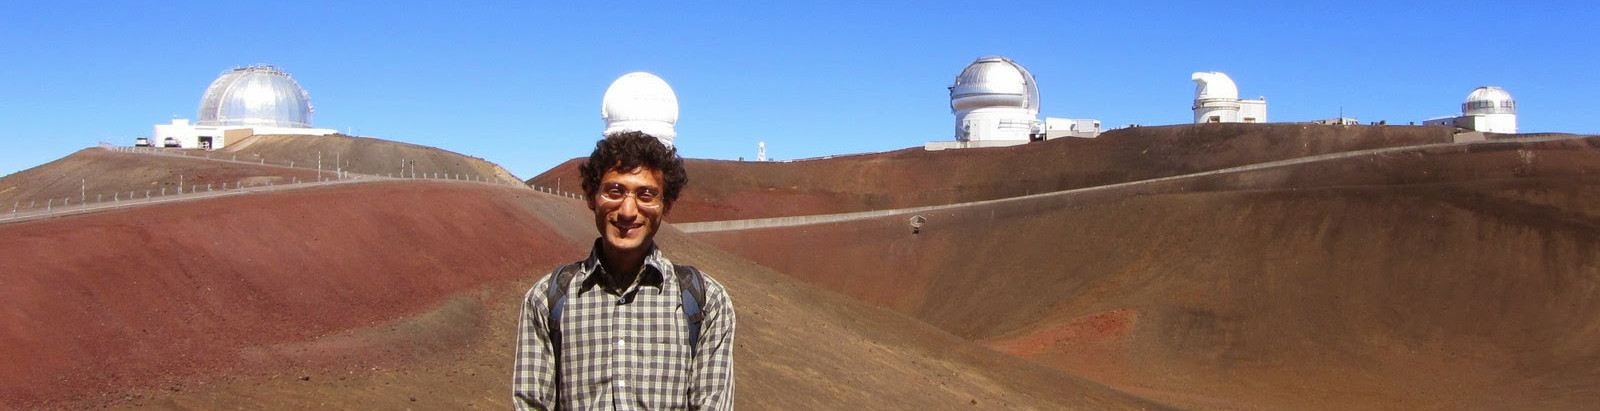 Kunal at the Mauna Kea summit